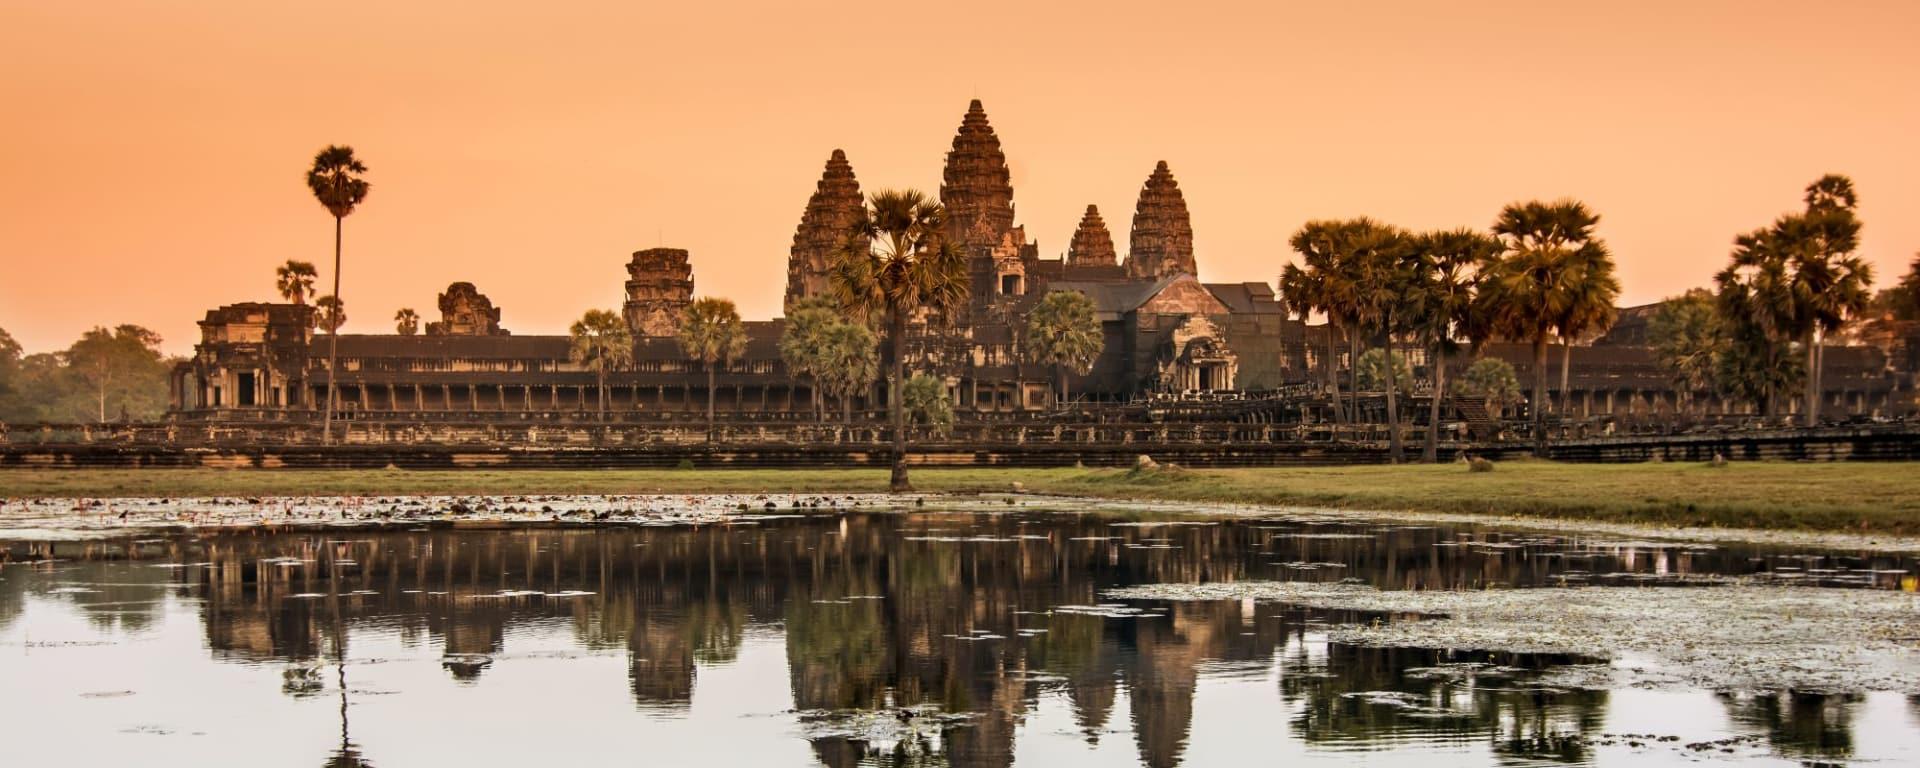 A la découverte d'Angkor à Siem Reap: Siem Reap Angkor Wat